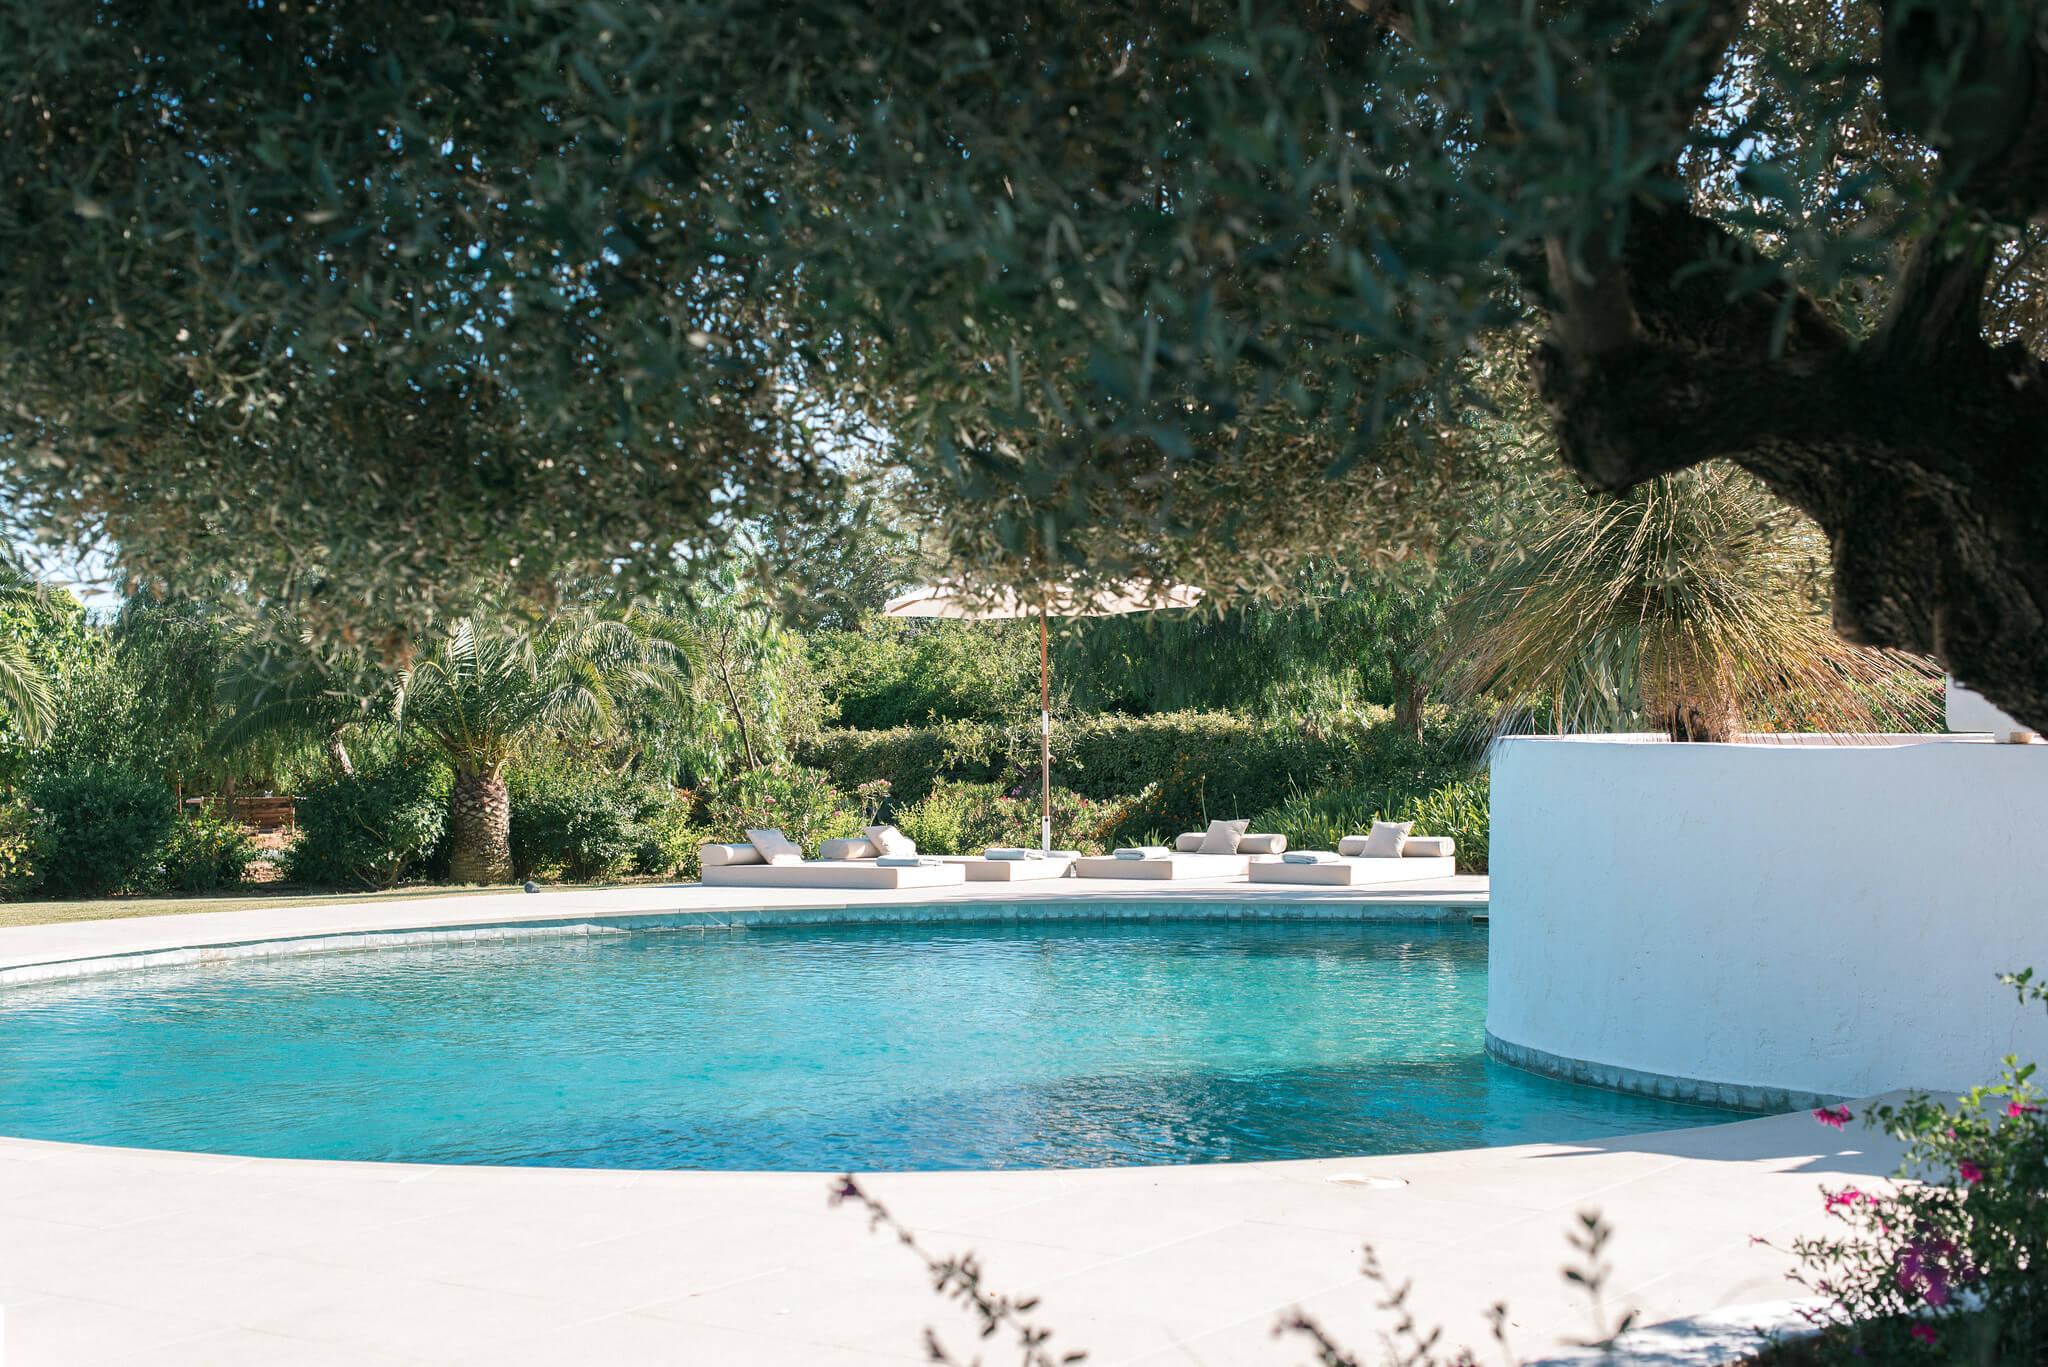 https://www.white-ibiza.com/wp-content/uploads/2020/06/white-ibiza-villas-casa-odette-exterior-pool-side.jpg